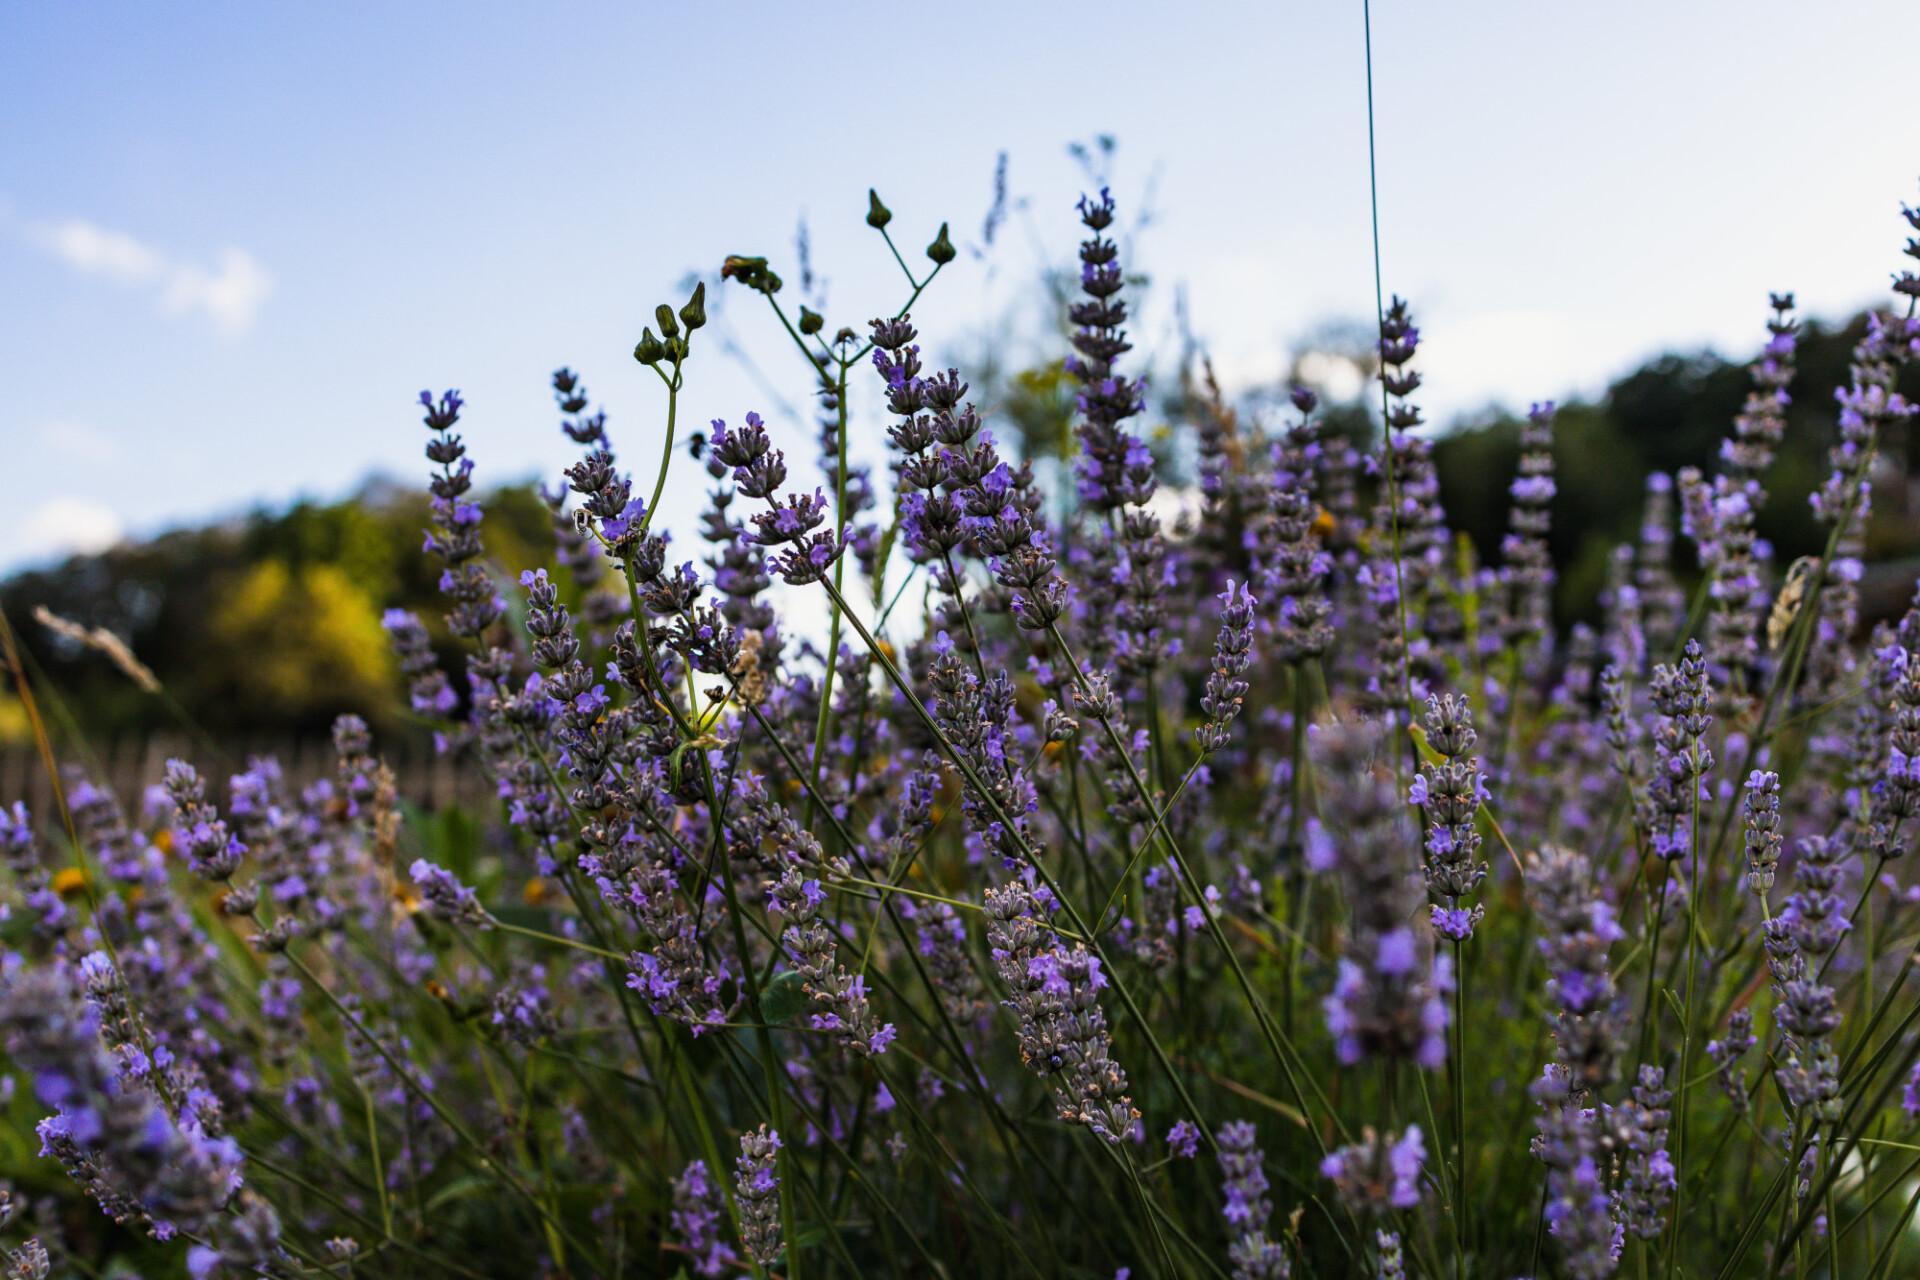 Lavender grows in wild meadow